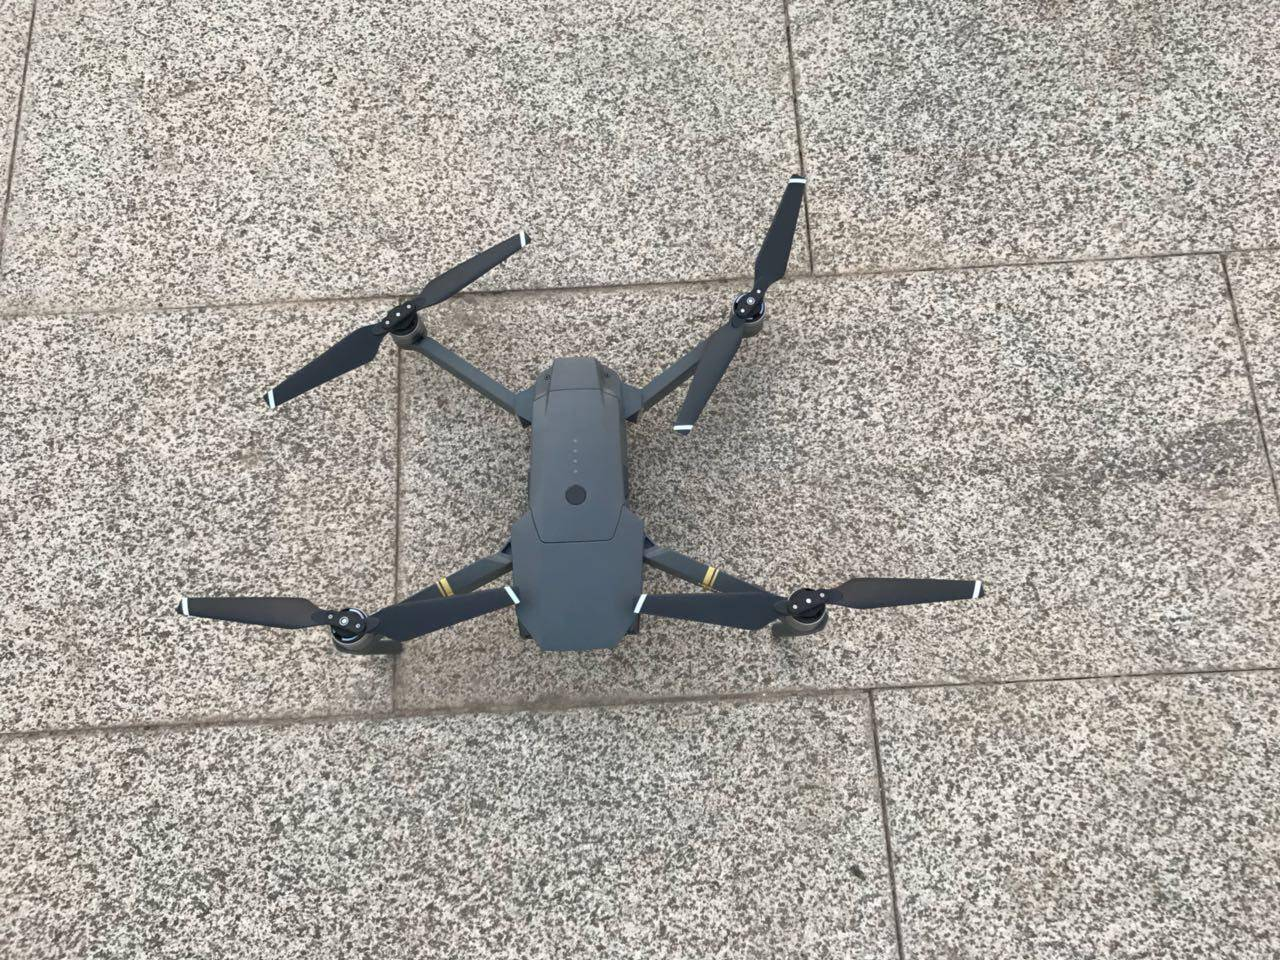 Promotion drone film, avis avis sur drone x pro